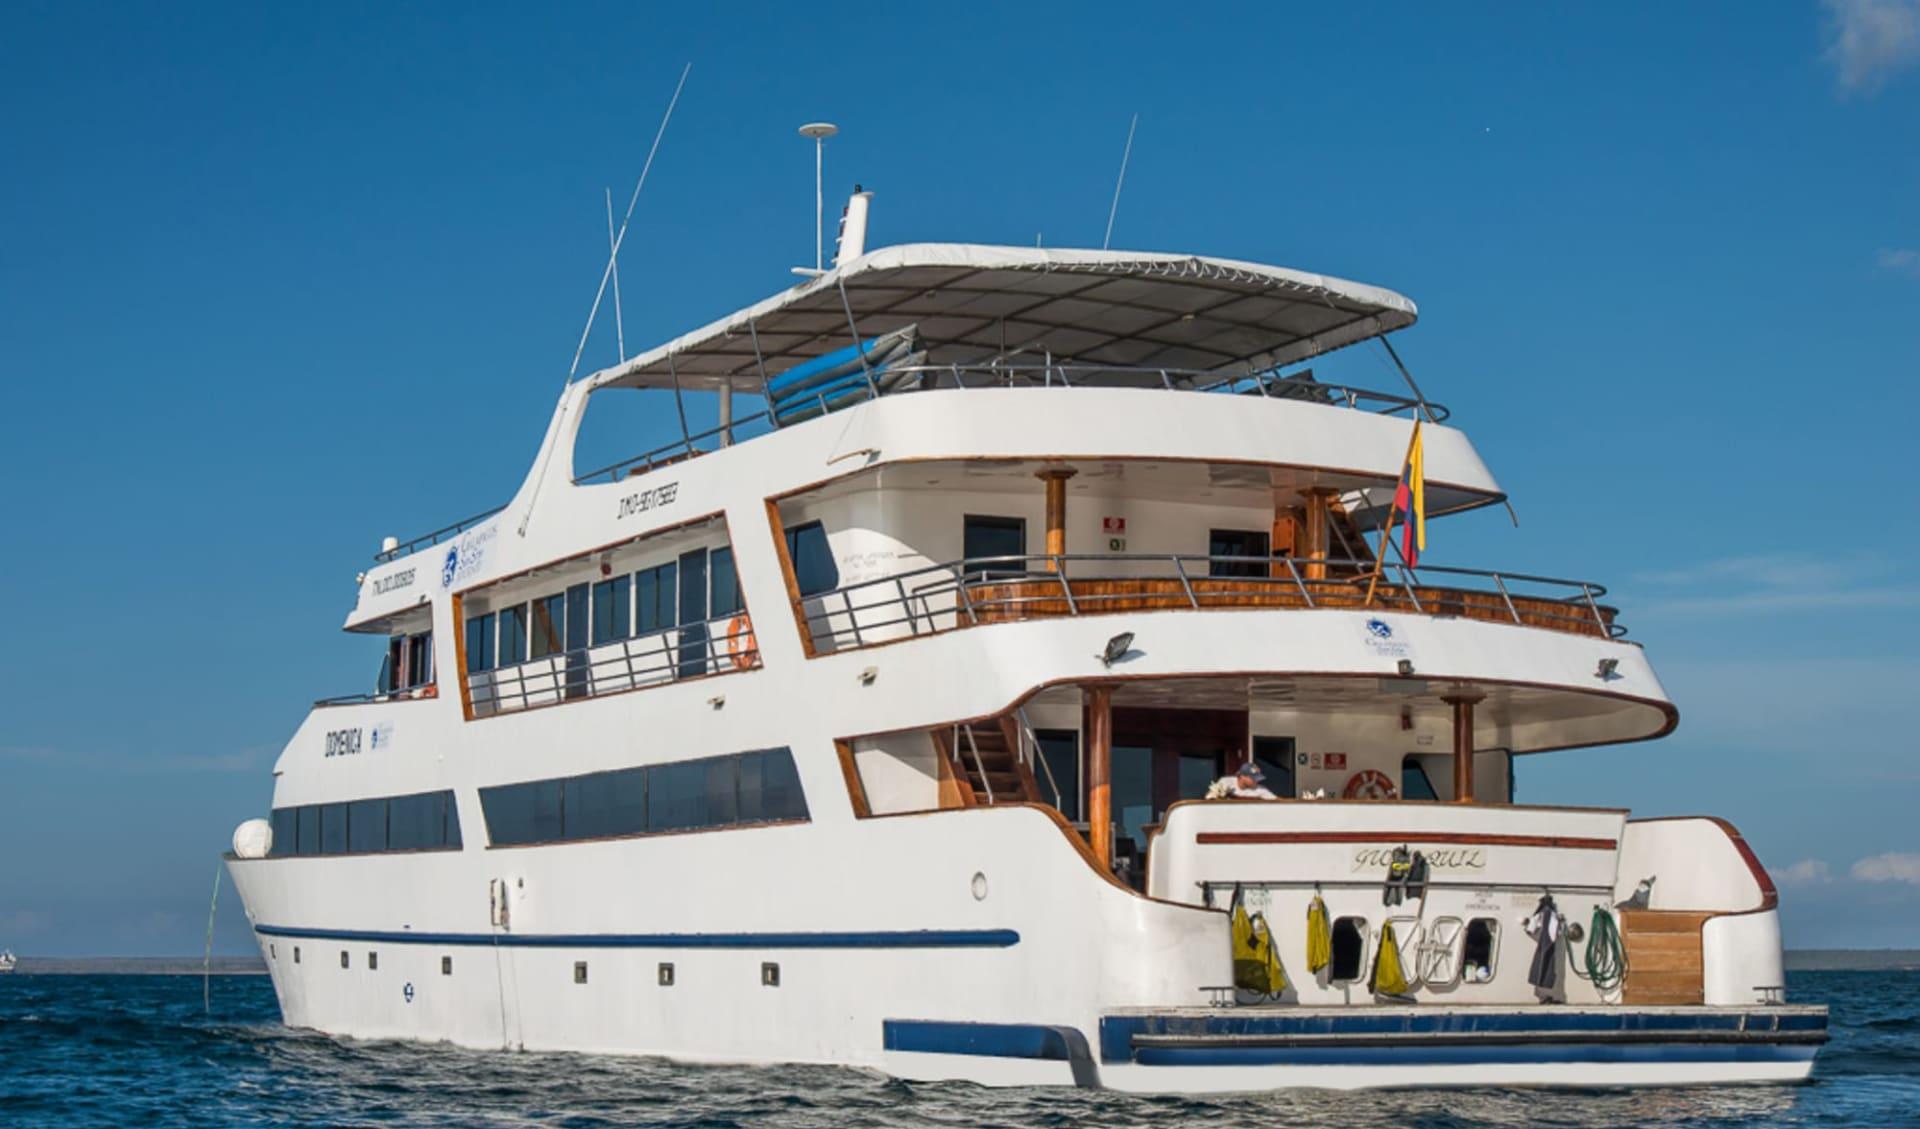 M/Y Sea Star Journey ab Puerto Ayora: MY Sea Star Journey